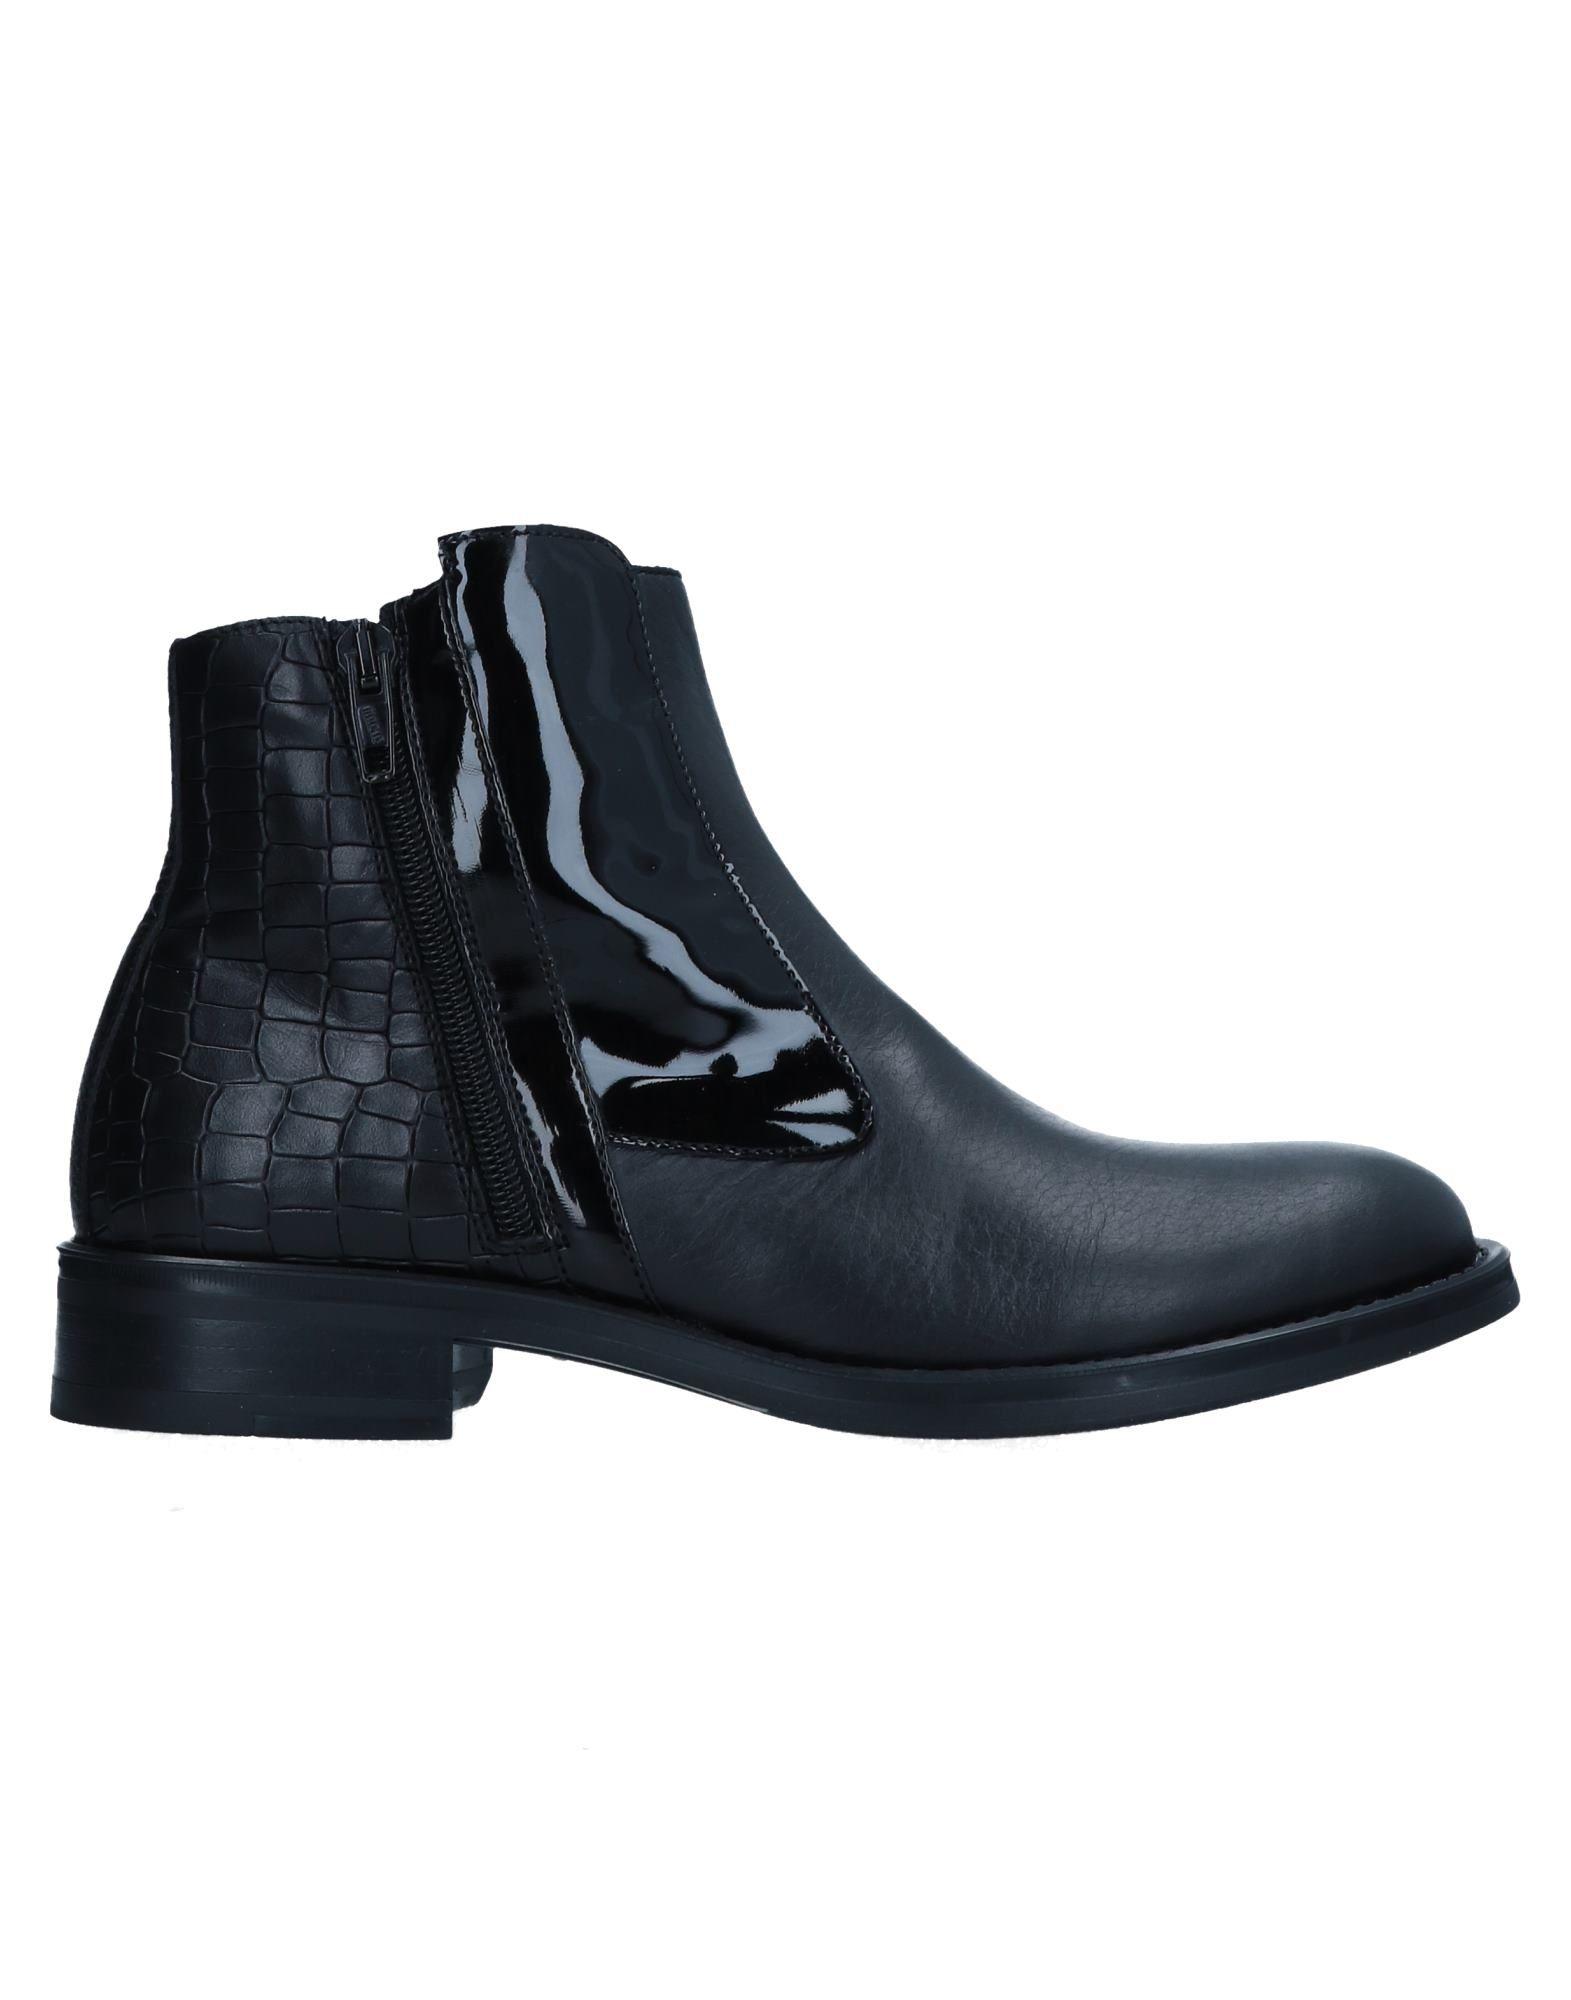 Gianfranco Lattanzi Stiefelette Damen  11547297KMGut aussehende strapazierfähige Schuhe